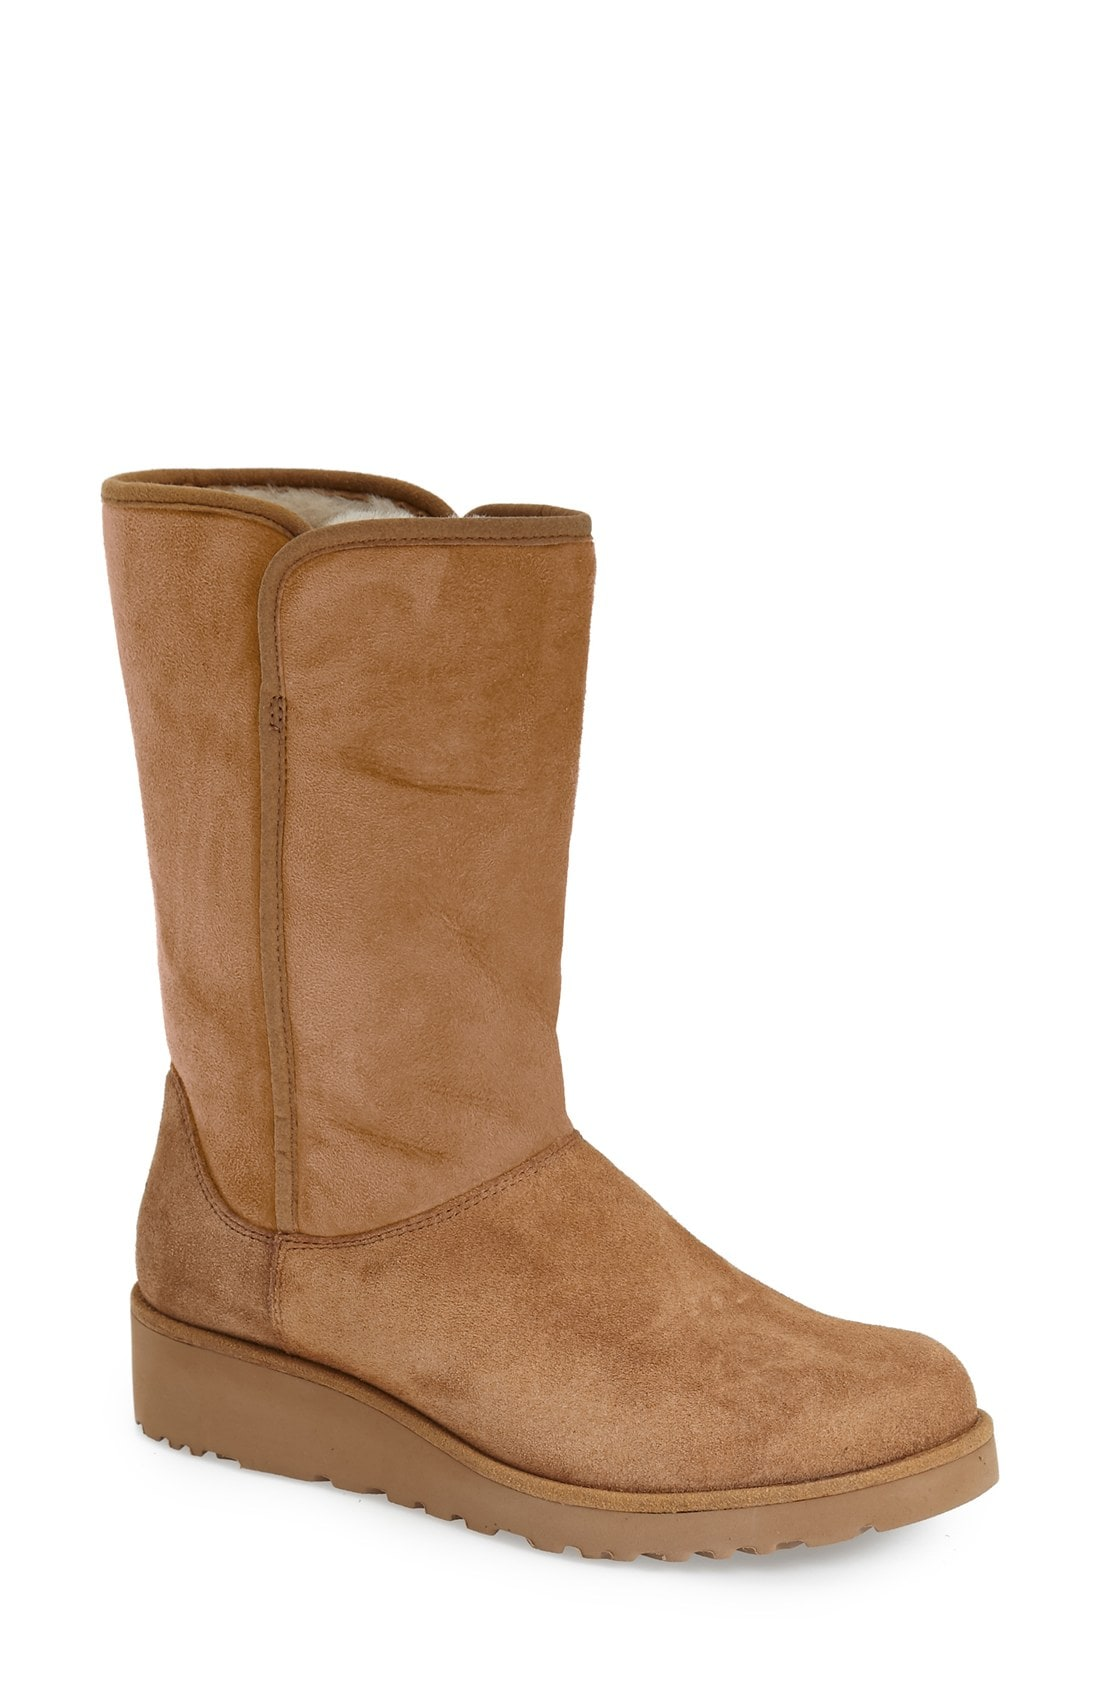 UGG Amie - Classic Slim Water Resistant Short Boot (Women)